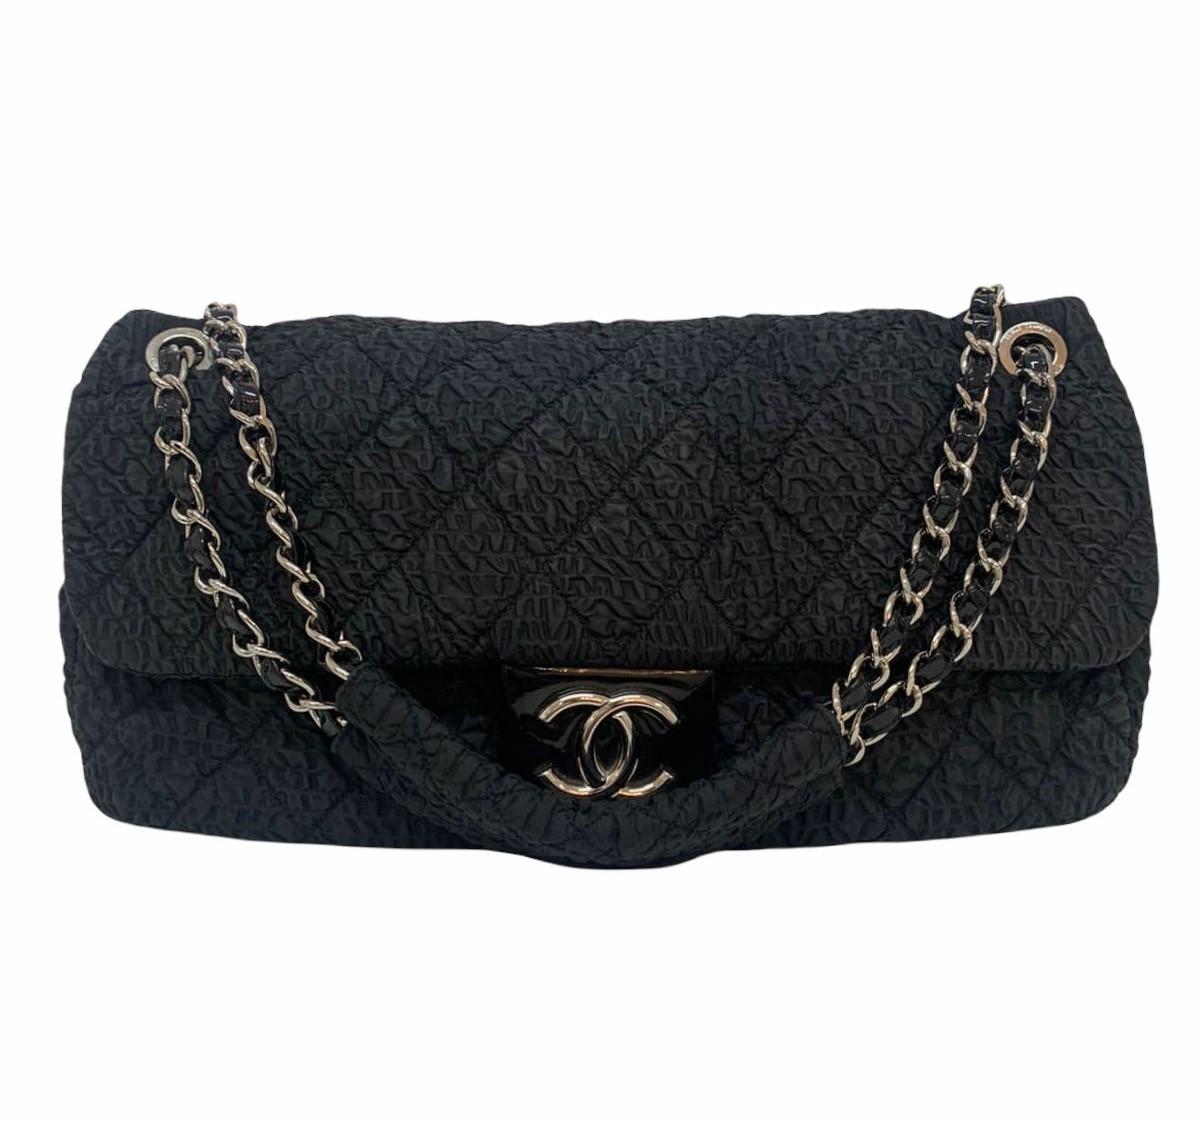 Bolsa Chanel Classic Flap XL Large Plush Textured Black